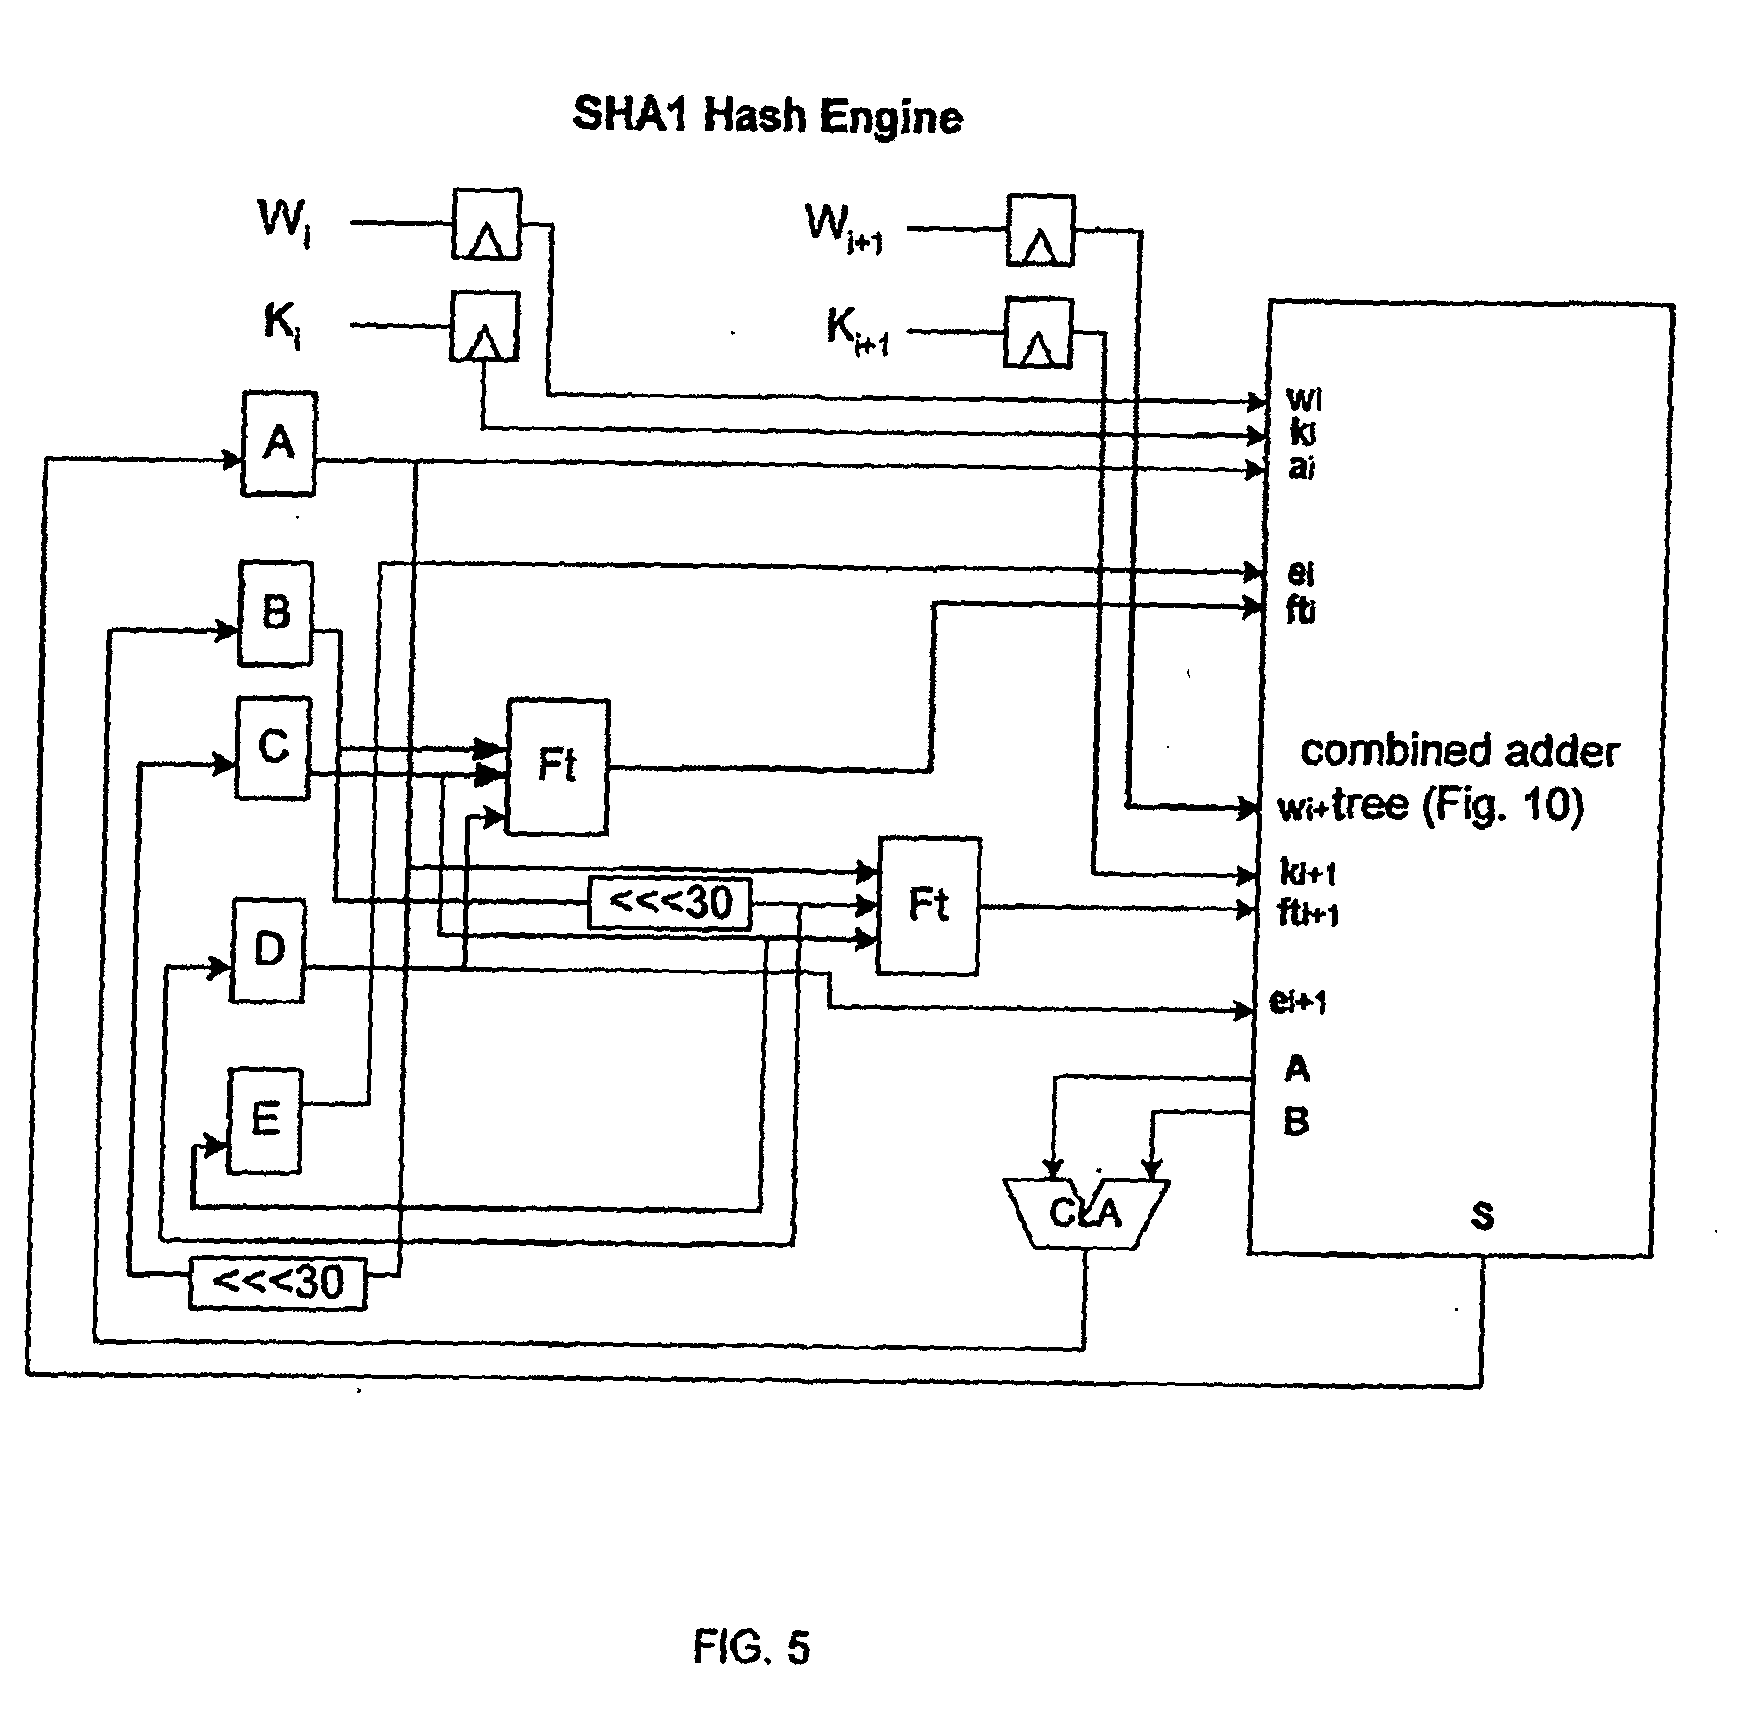 patent epb  implentation of the sha algorithm  google, wiring diagram